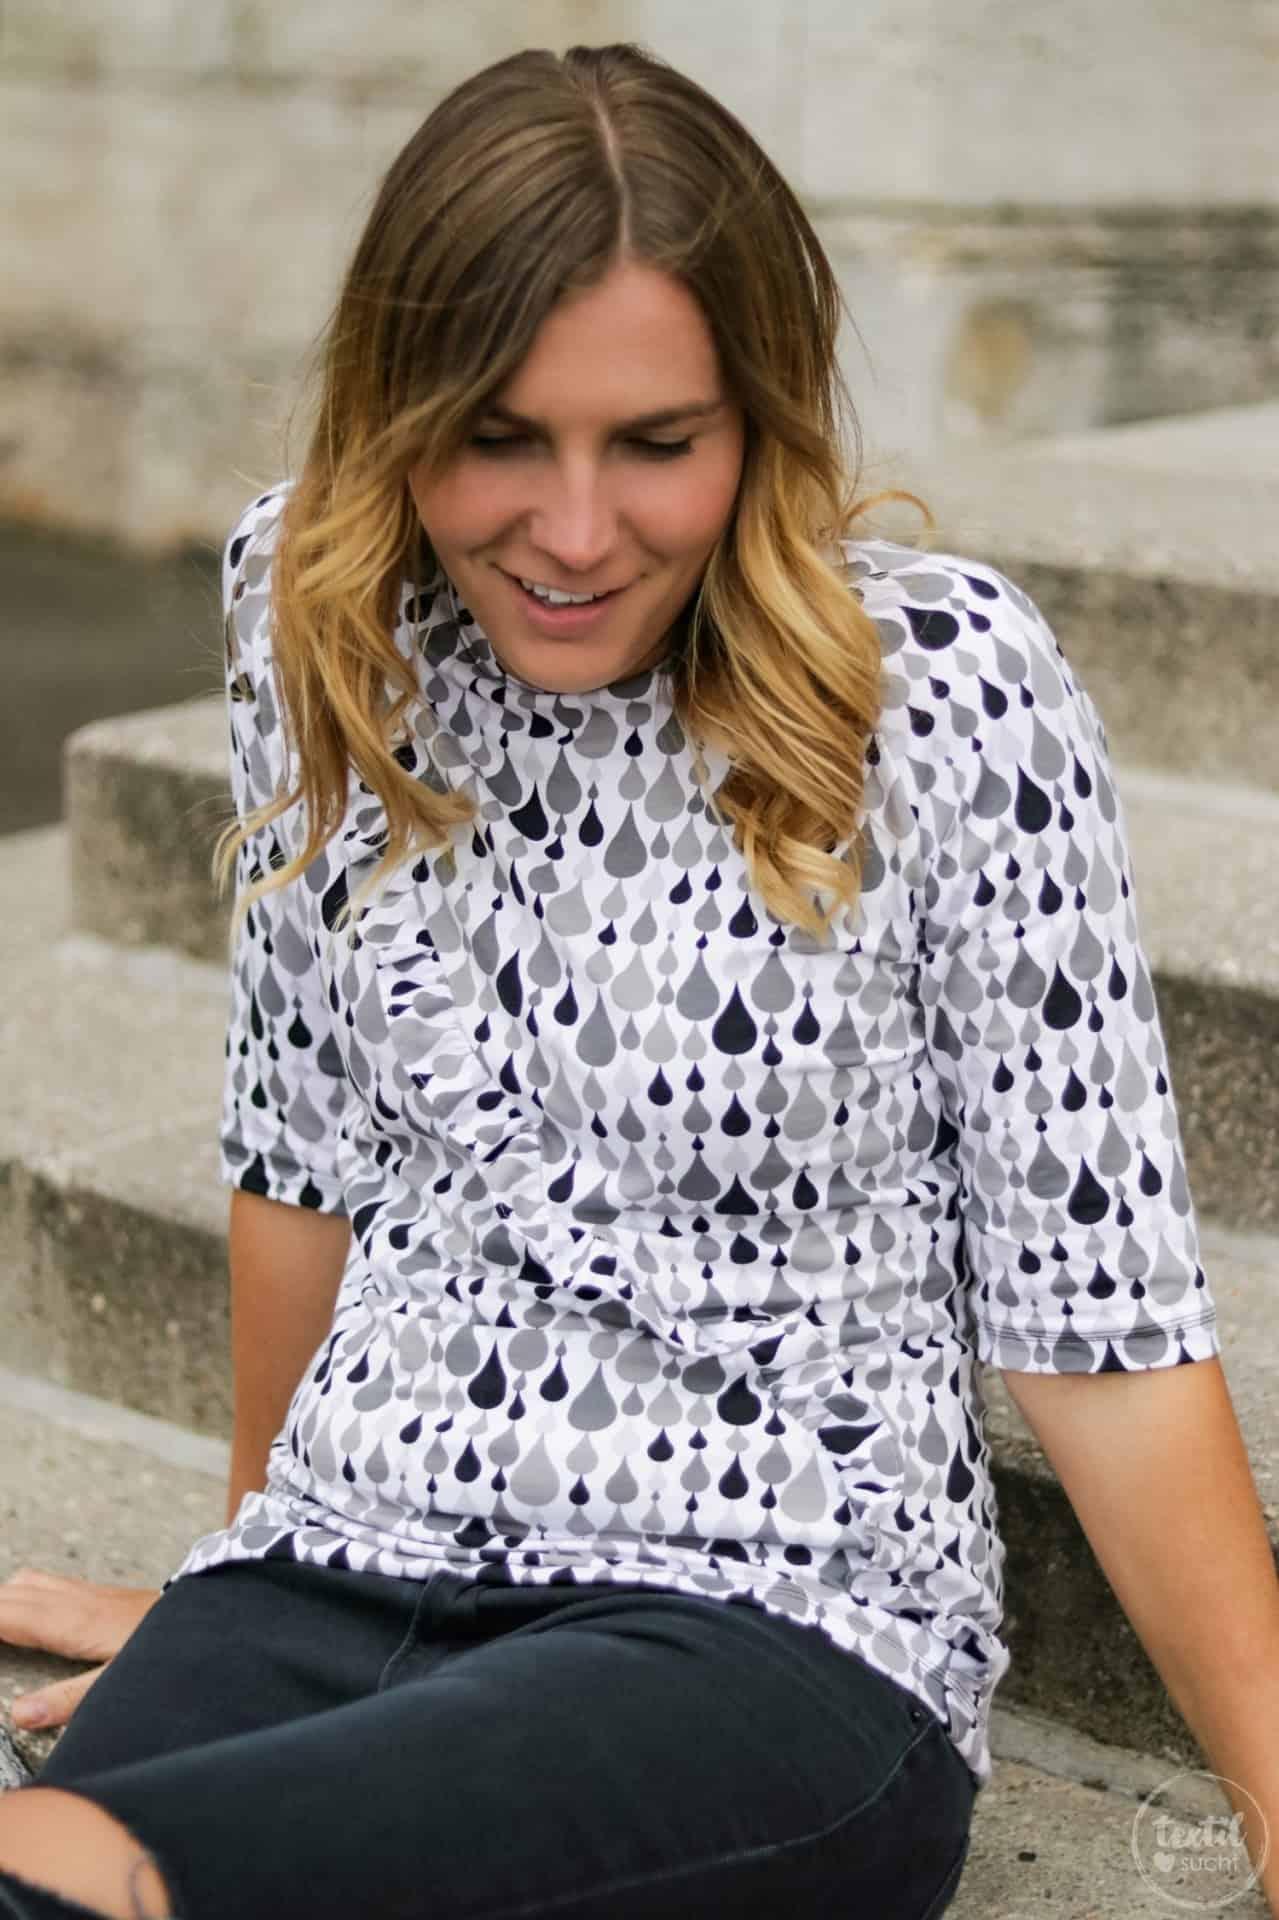 Schnittmuster kombinieren: Shirt Rüschli, Cardigan Lani und Hose Romana - Bild 1   textilsucht.de